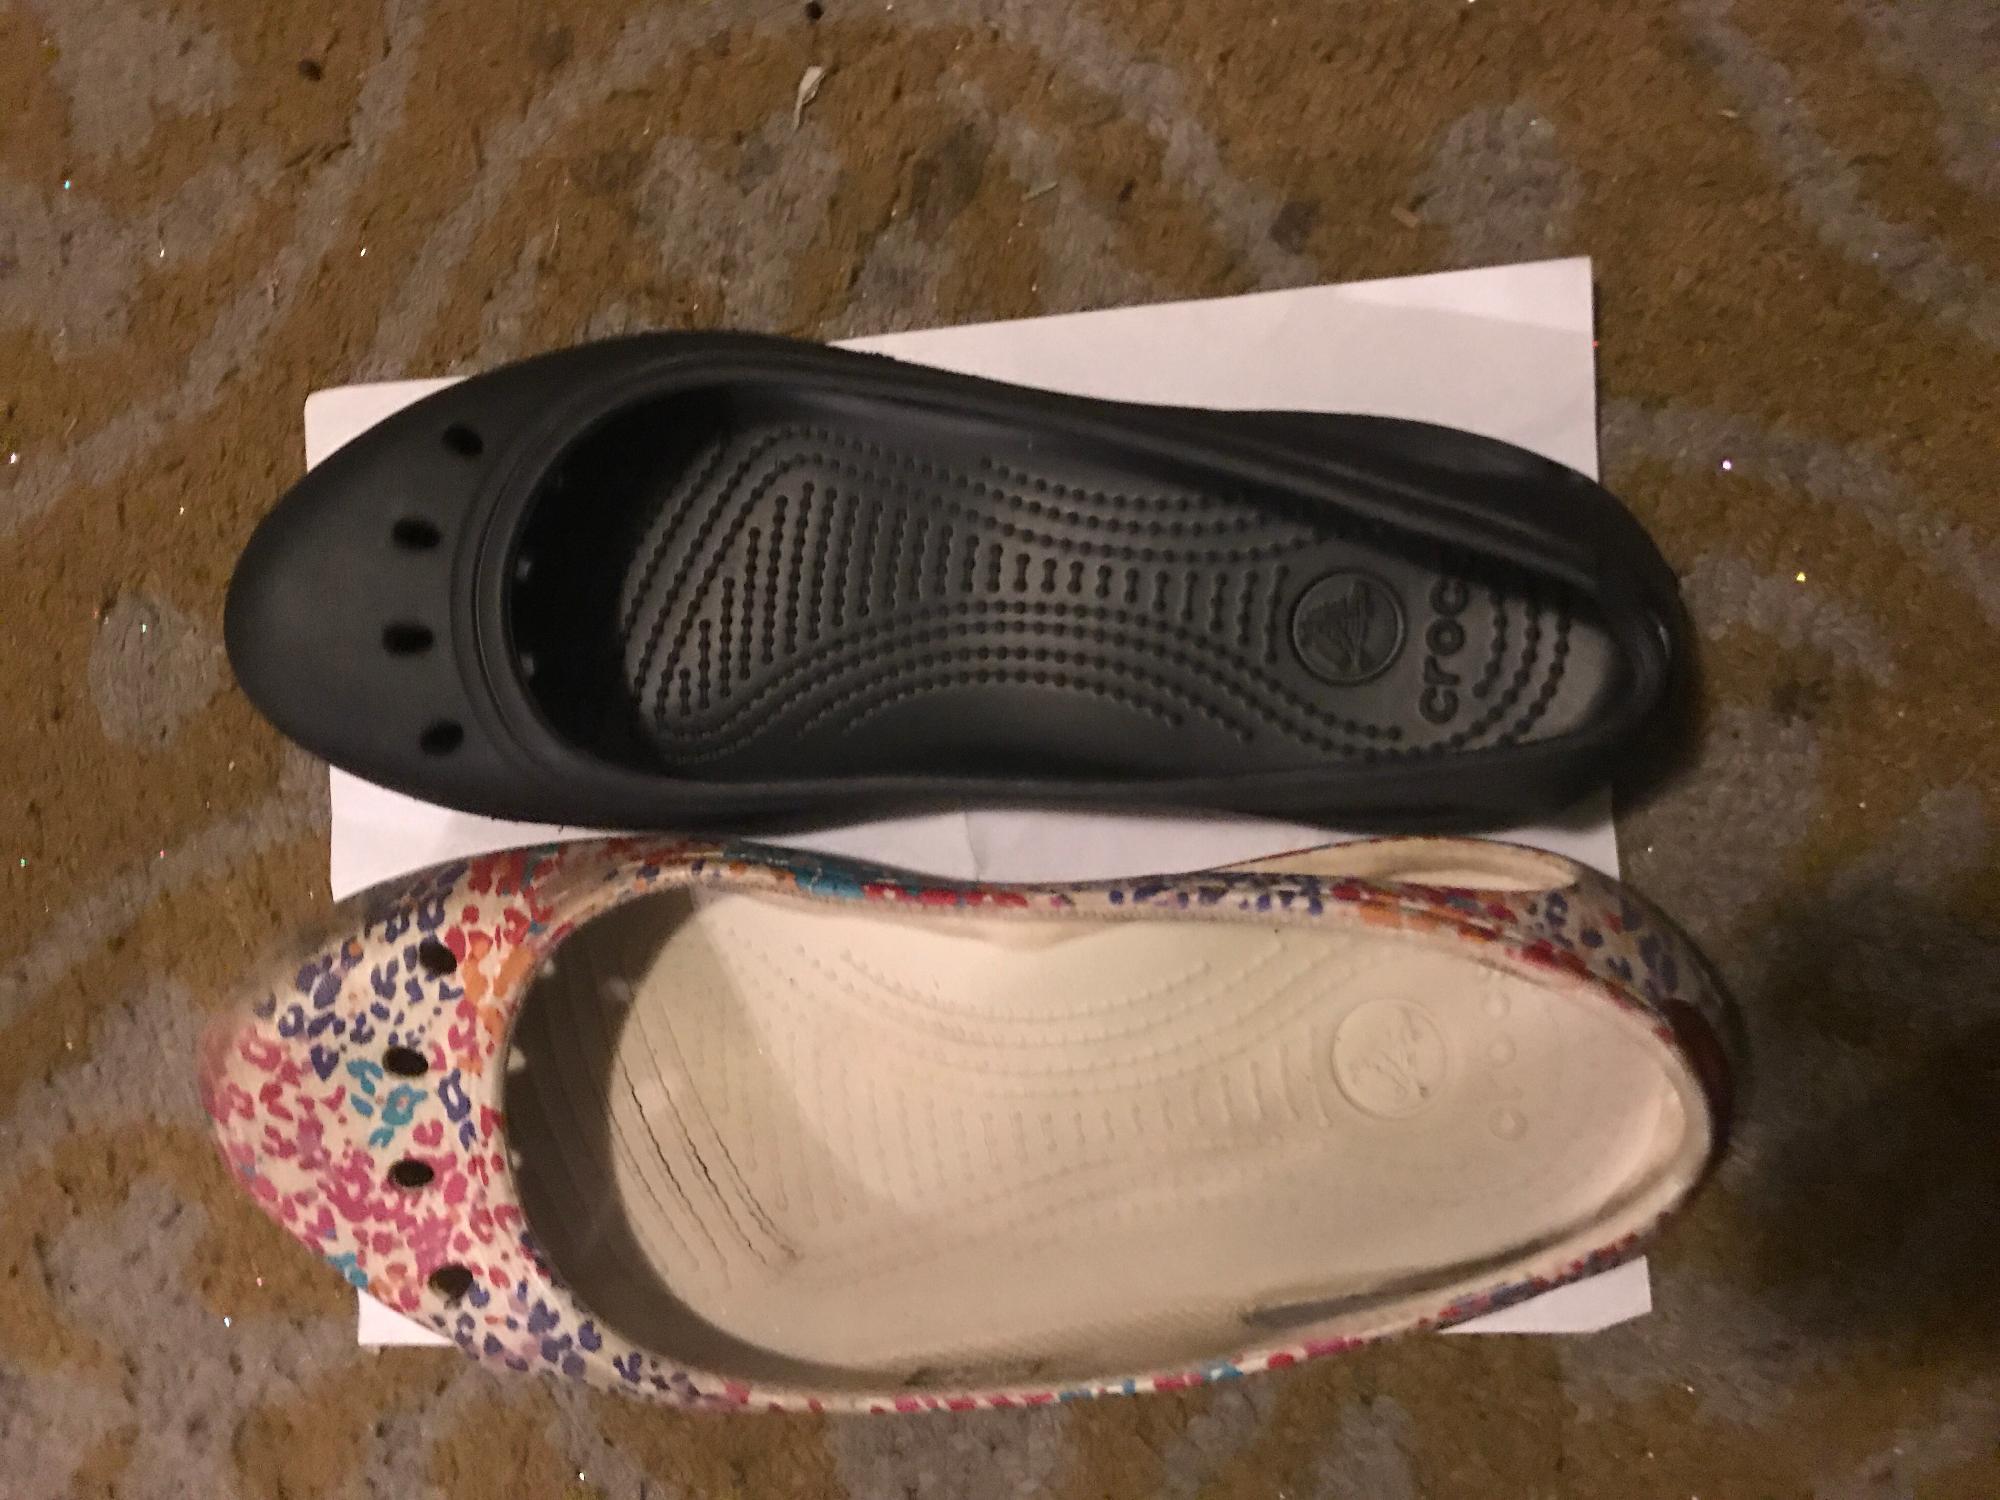 e81ddc532e8 Crocs Kadee Work Flat Reviews